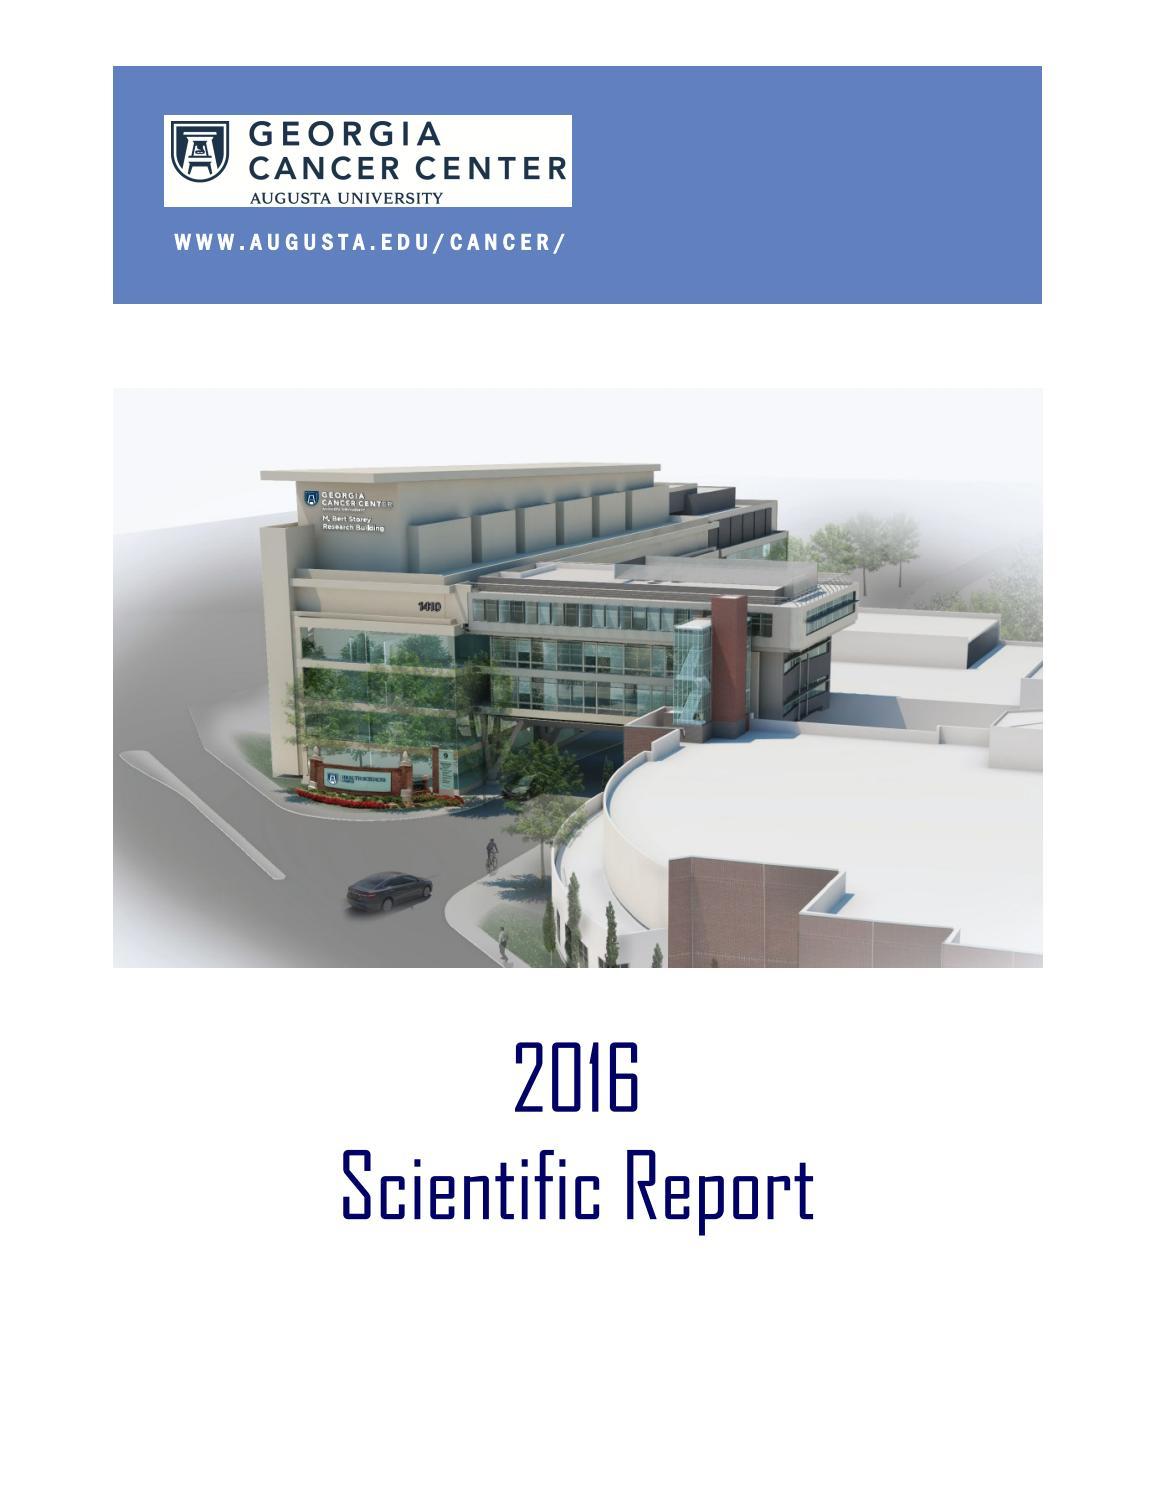 Georgia Cancer Center 2016 Scientific Report by Augusta